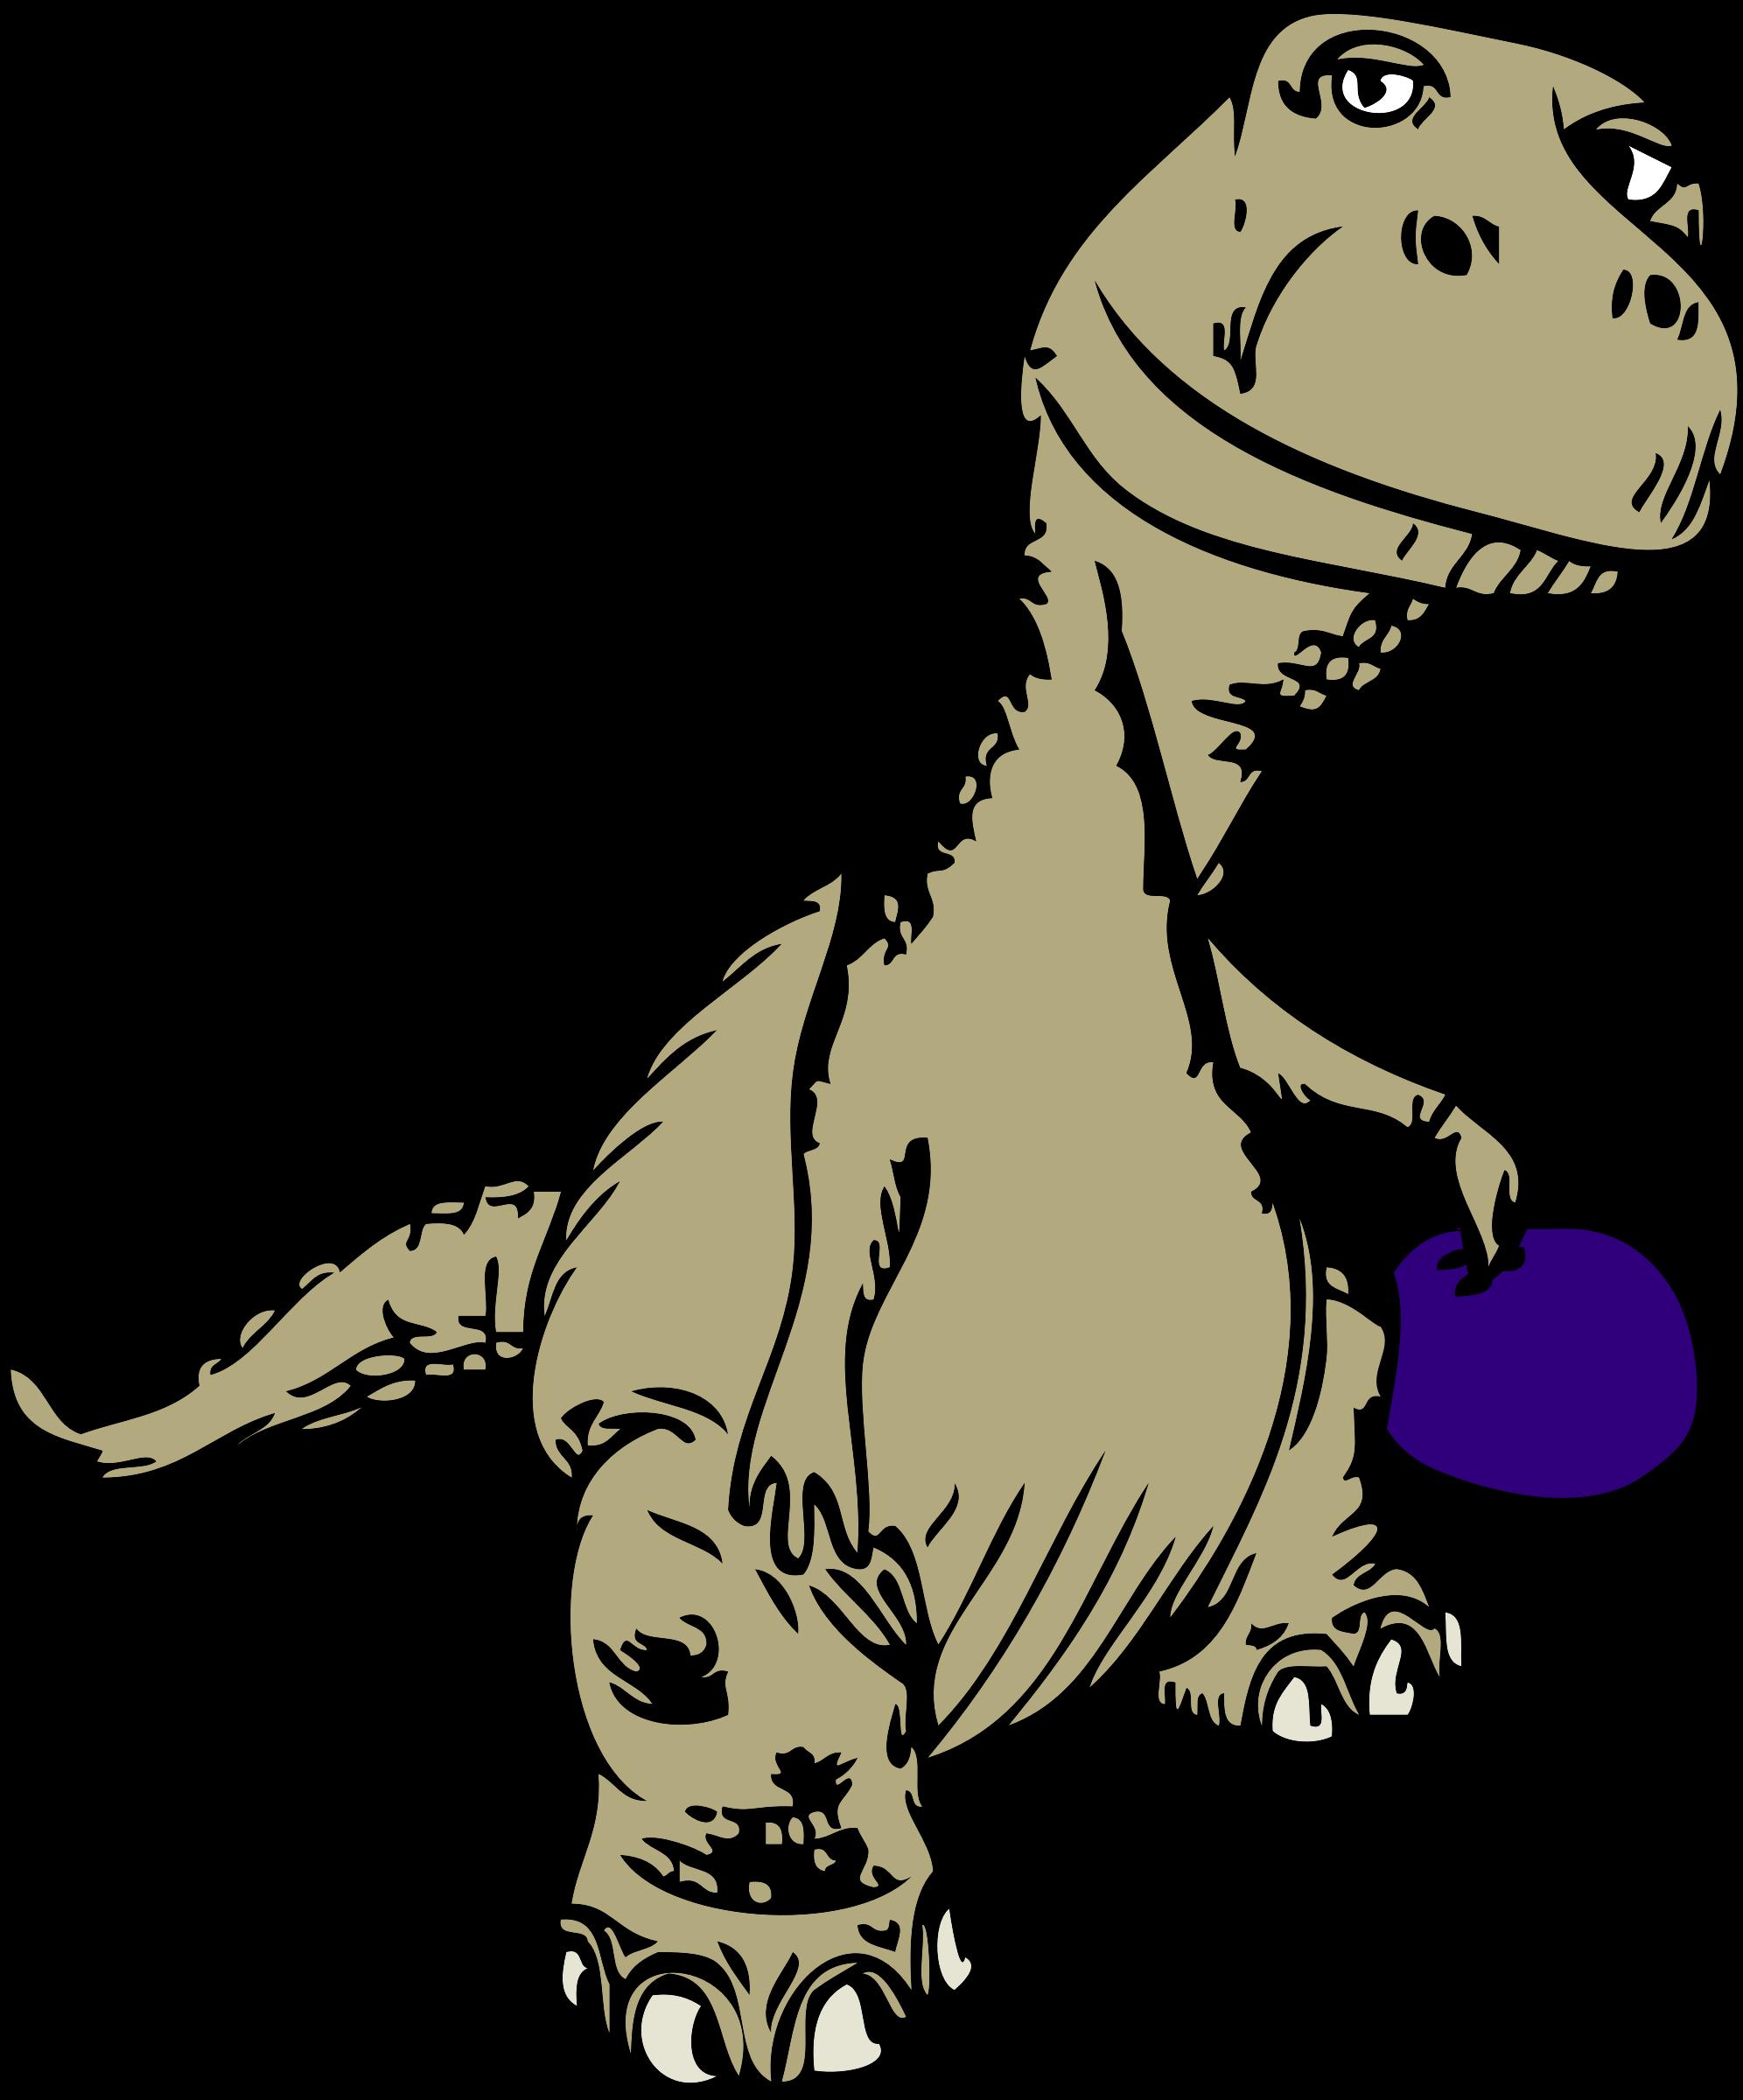 Dinosaur clipart tail. Johnny automatic remix big